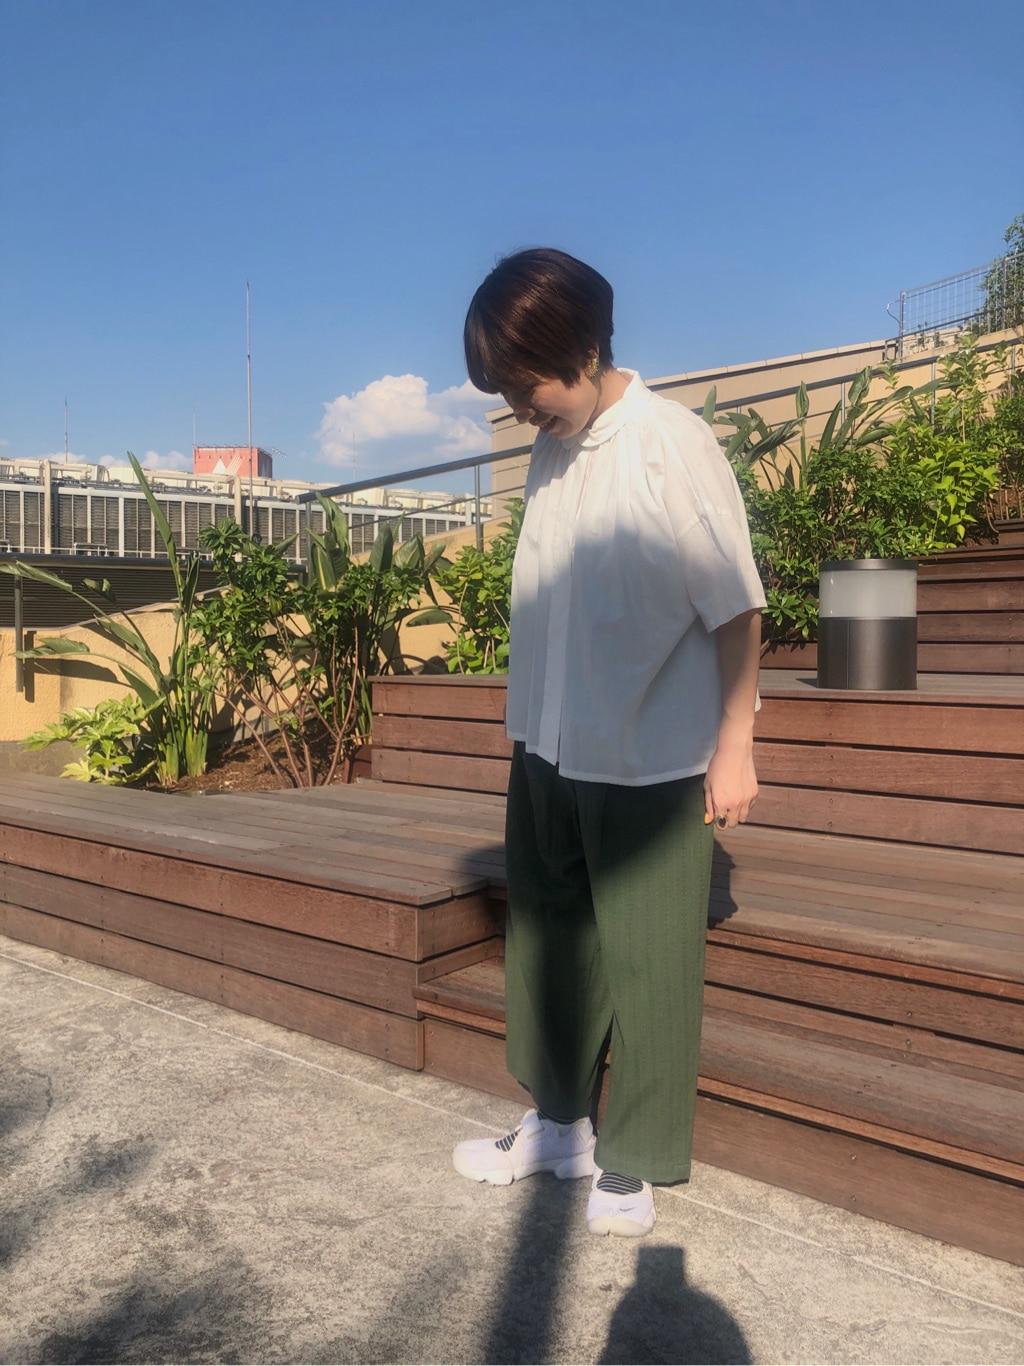 bulle de savon なんばシティ 身長:148cm 2020.06.06